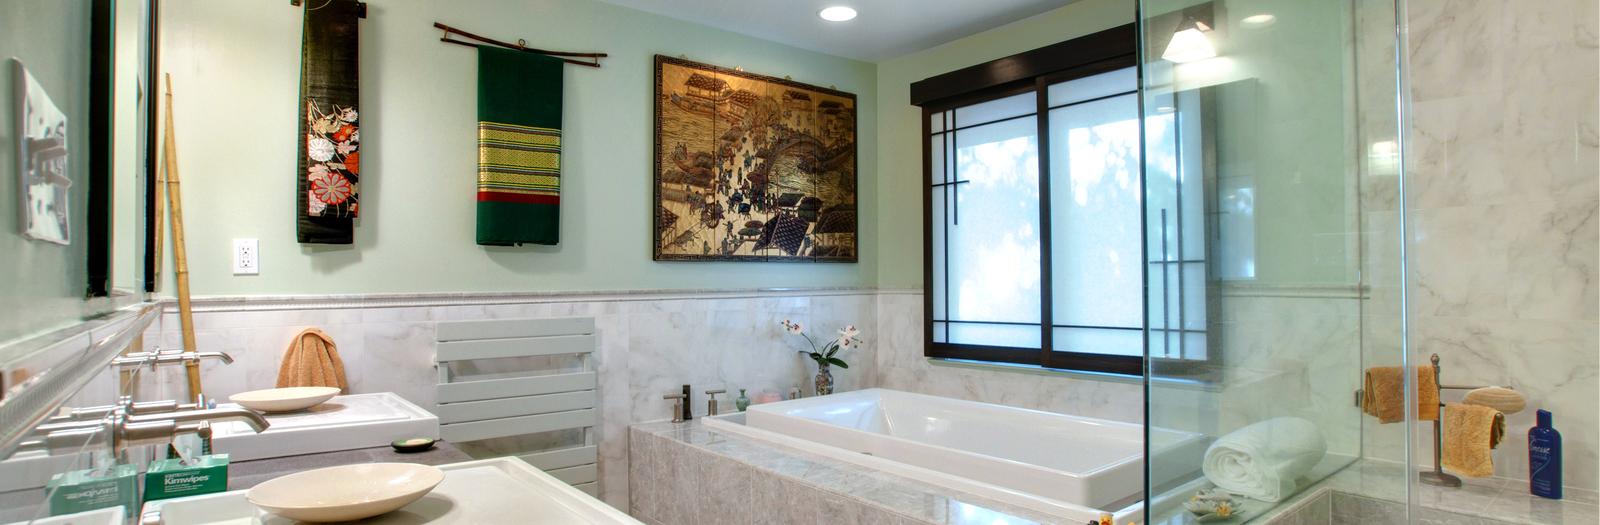 Ideas for home design decorating and remodeling designmine for International home decor llc